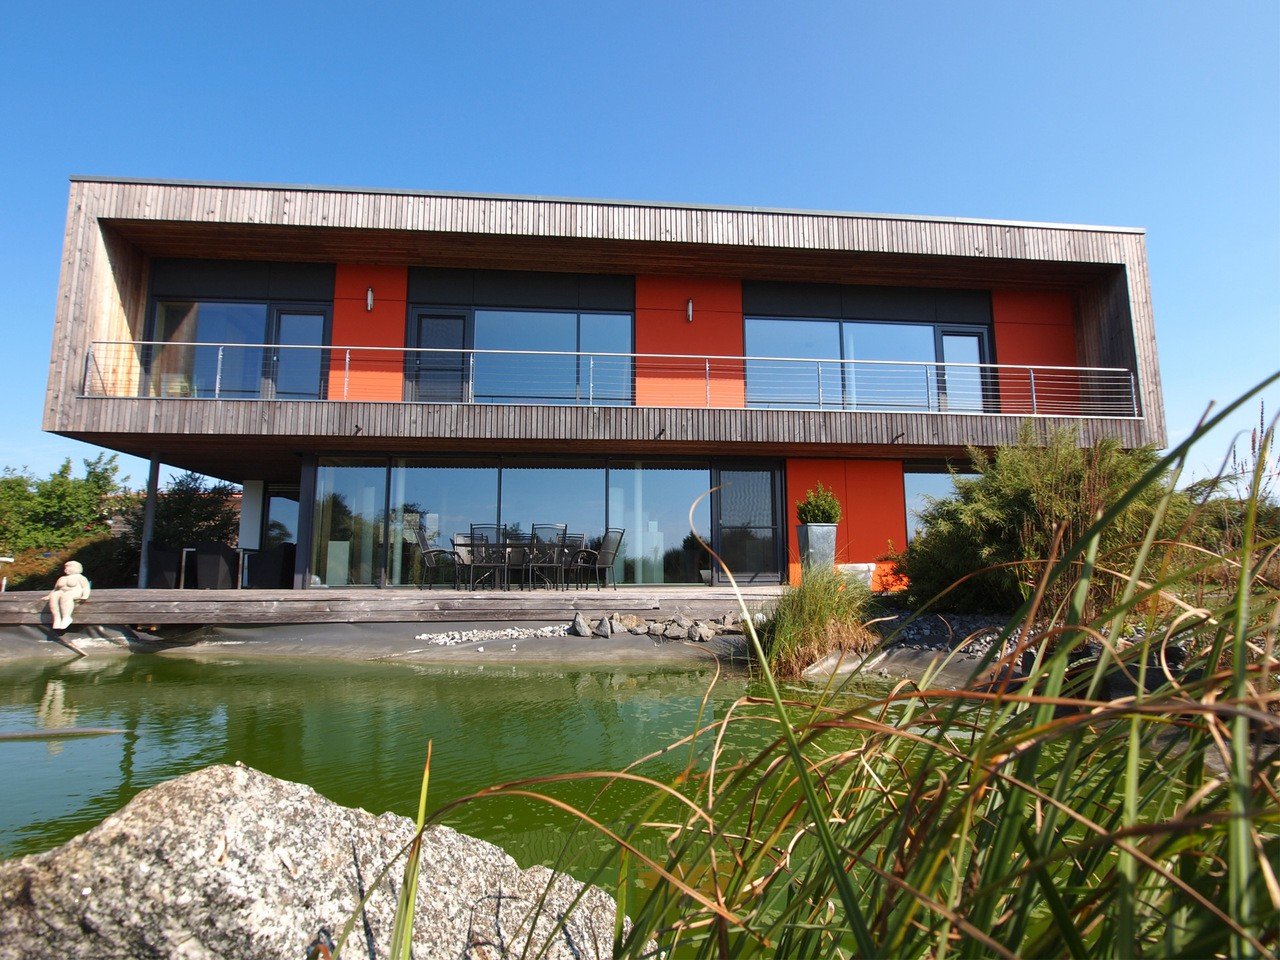 Holzbau Kielwein - Kundenhaus 1